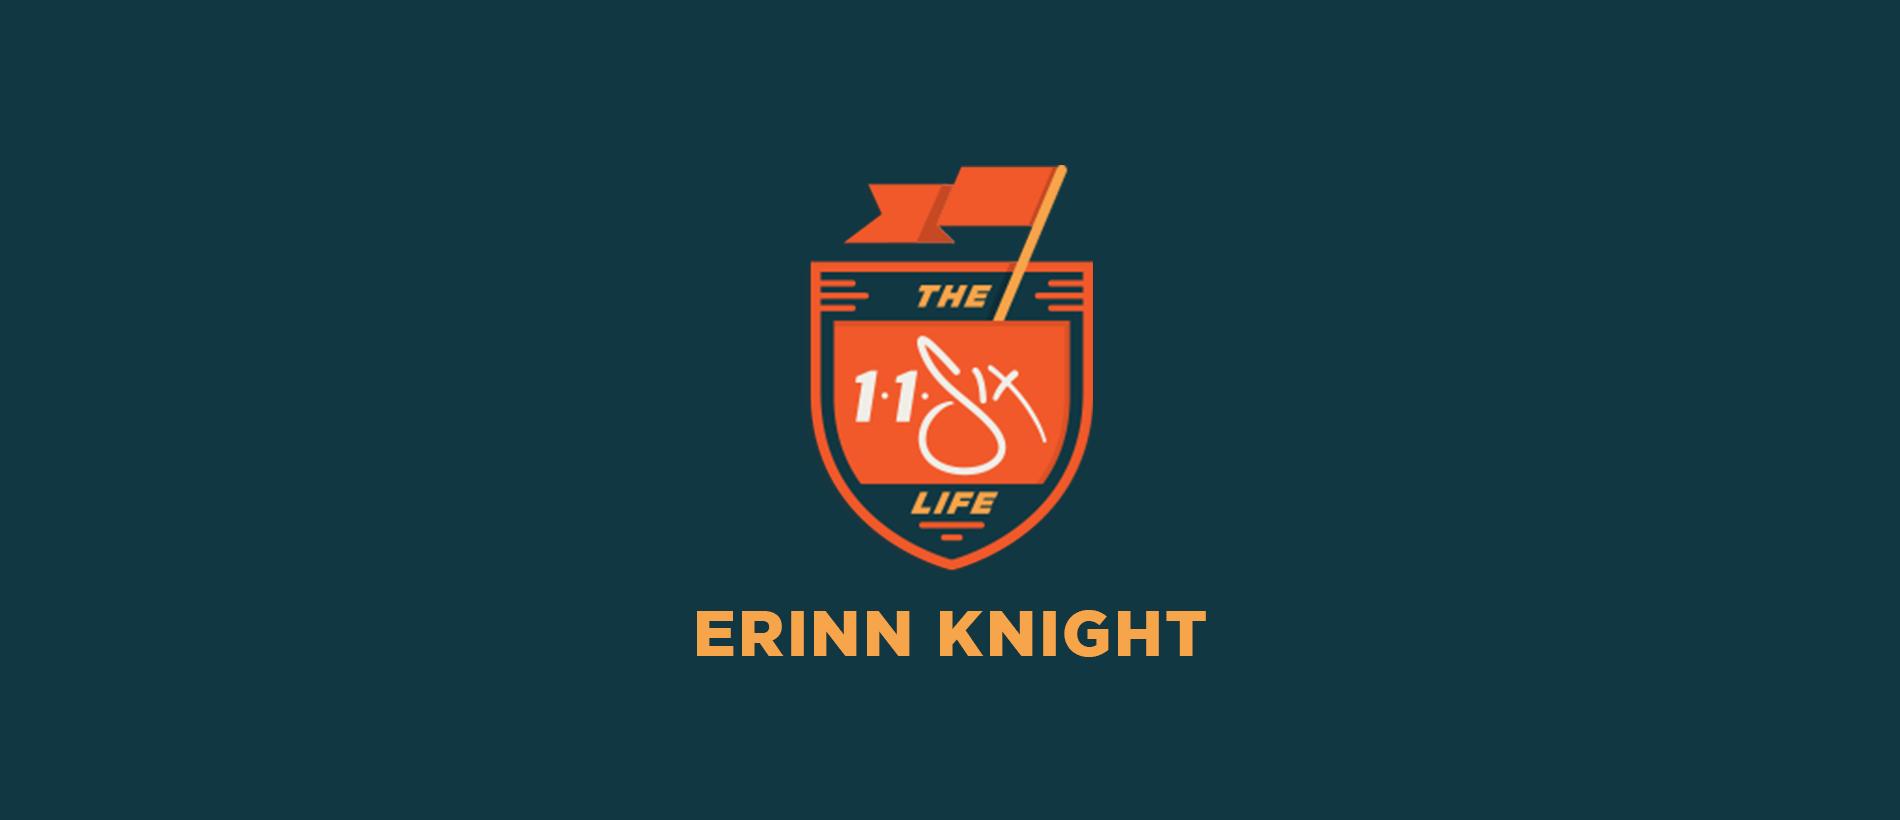 The 116 Life X Erinn Knight